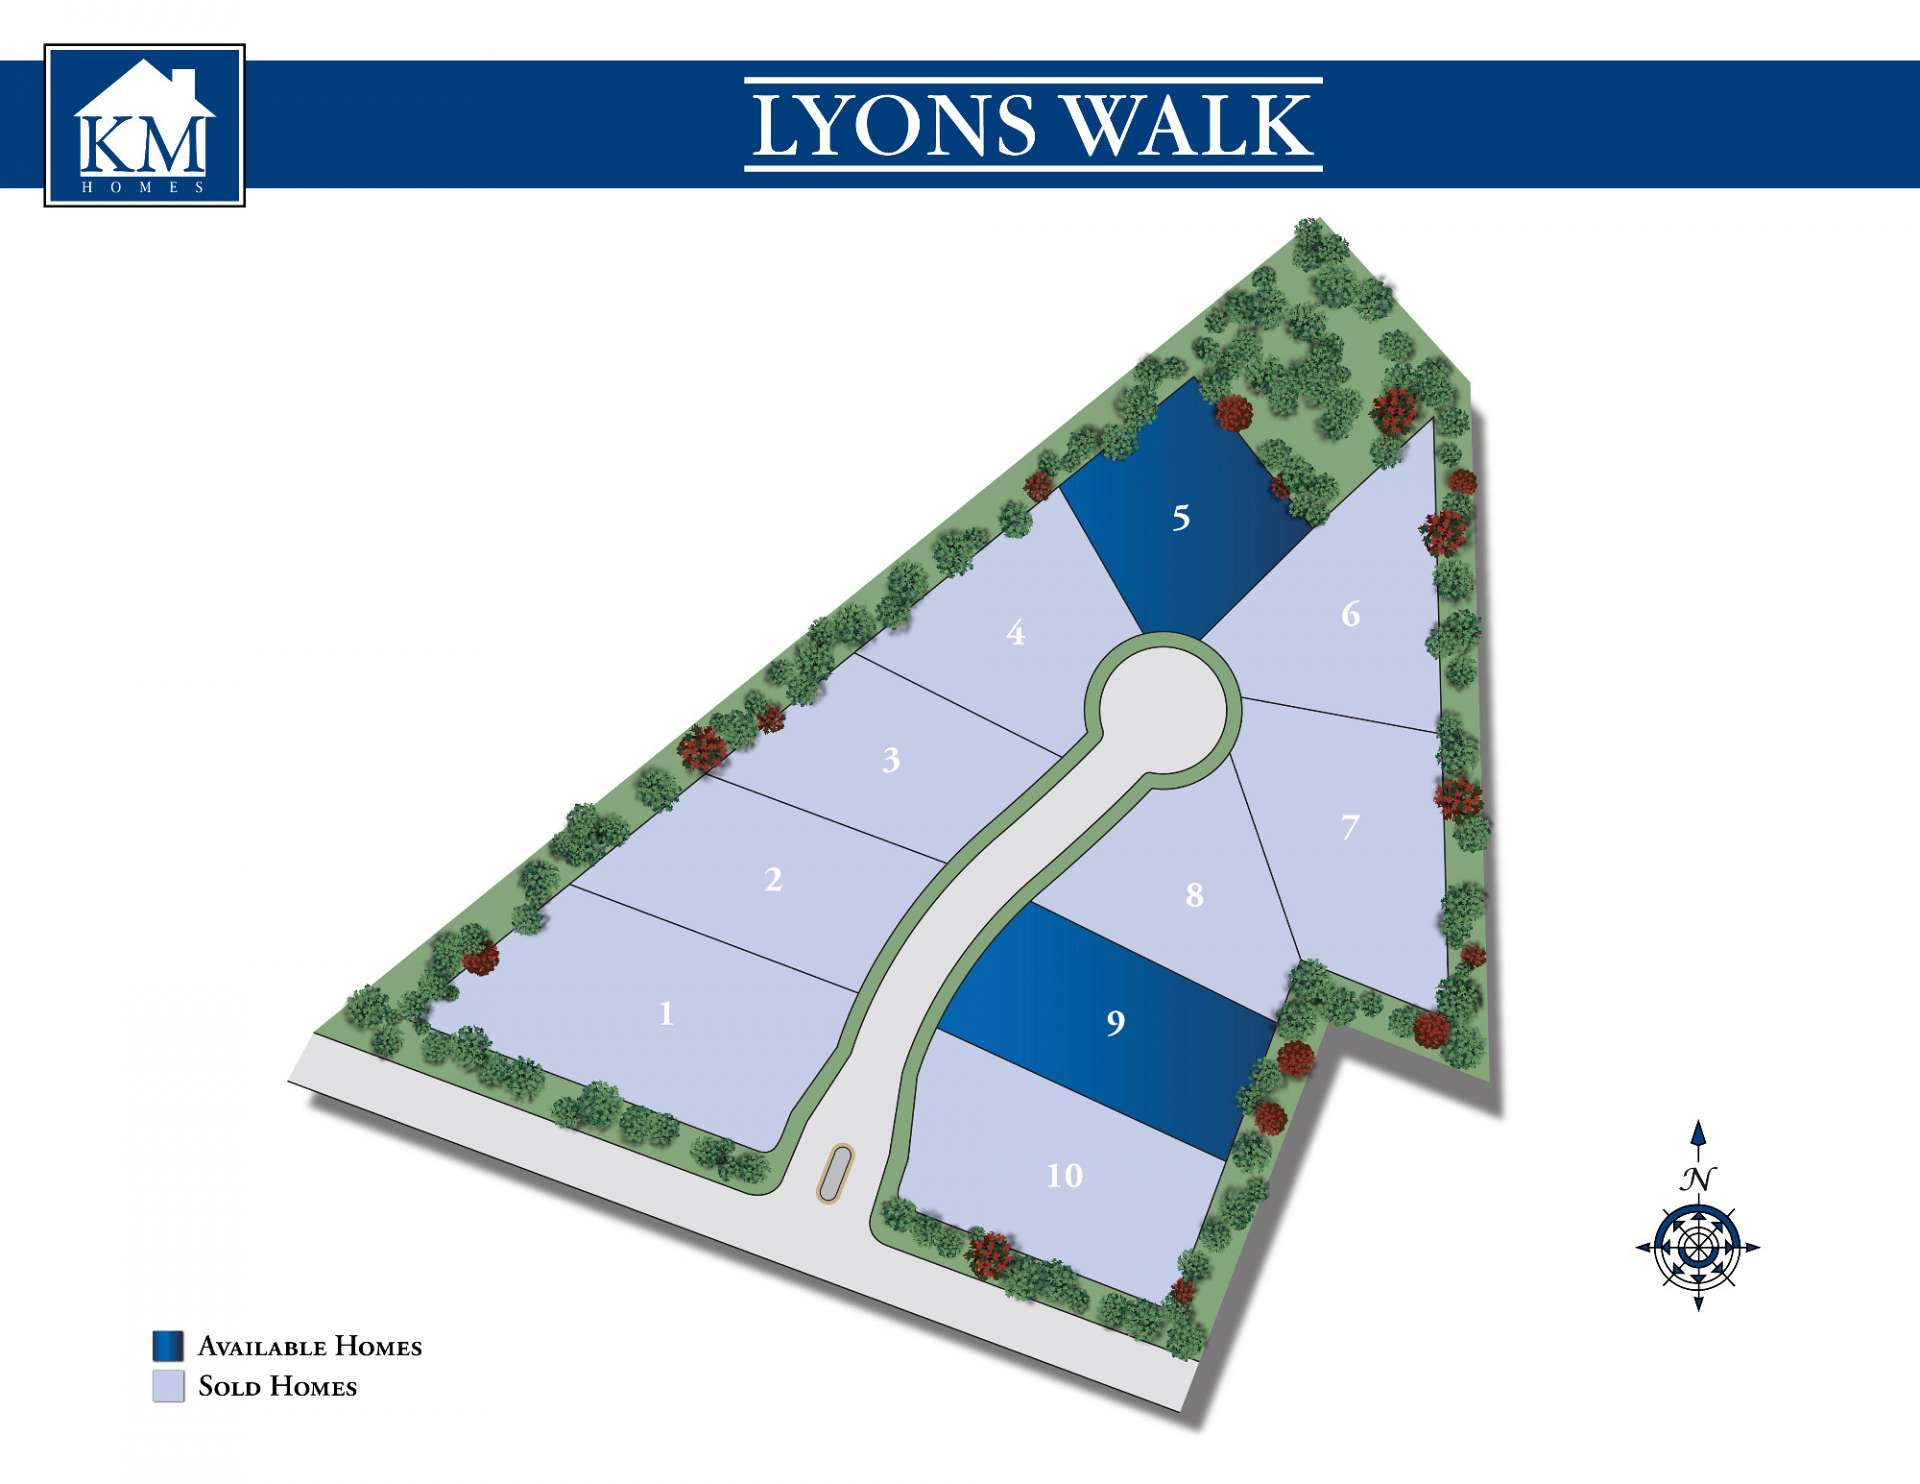 LyonsWalk.Hmst